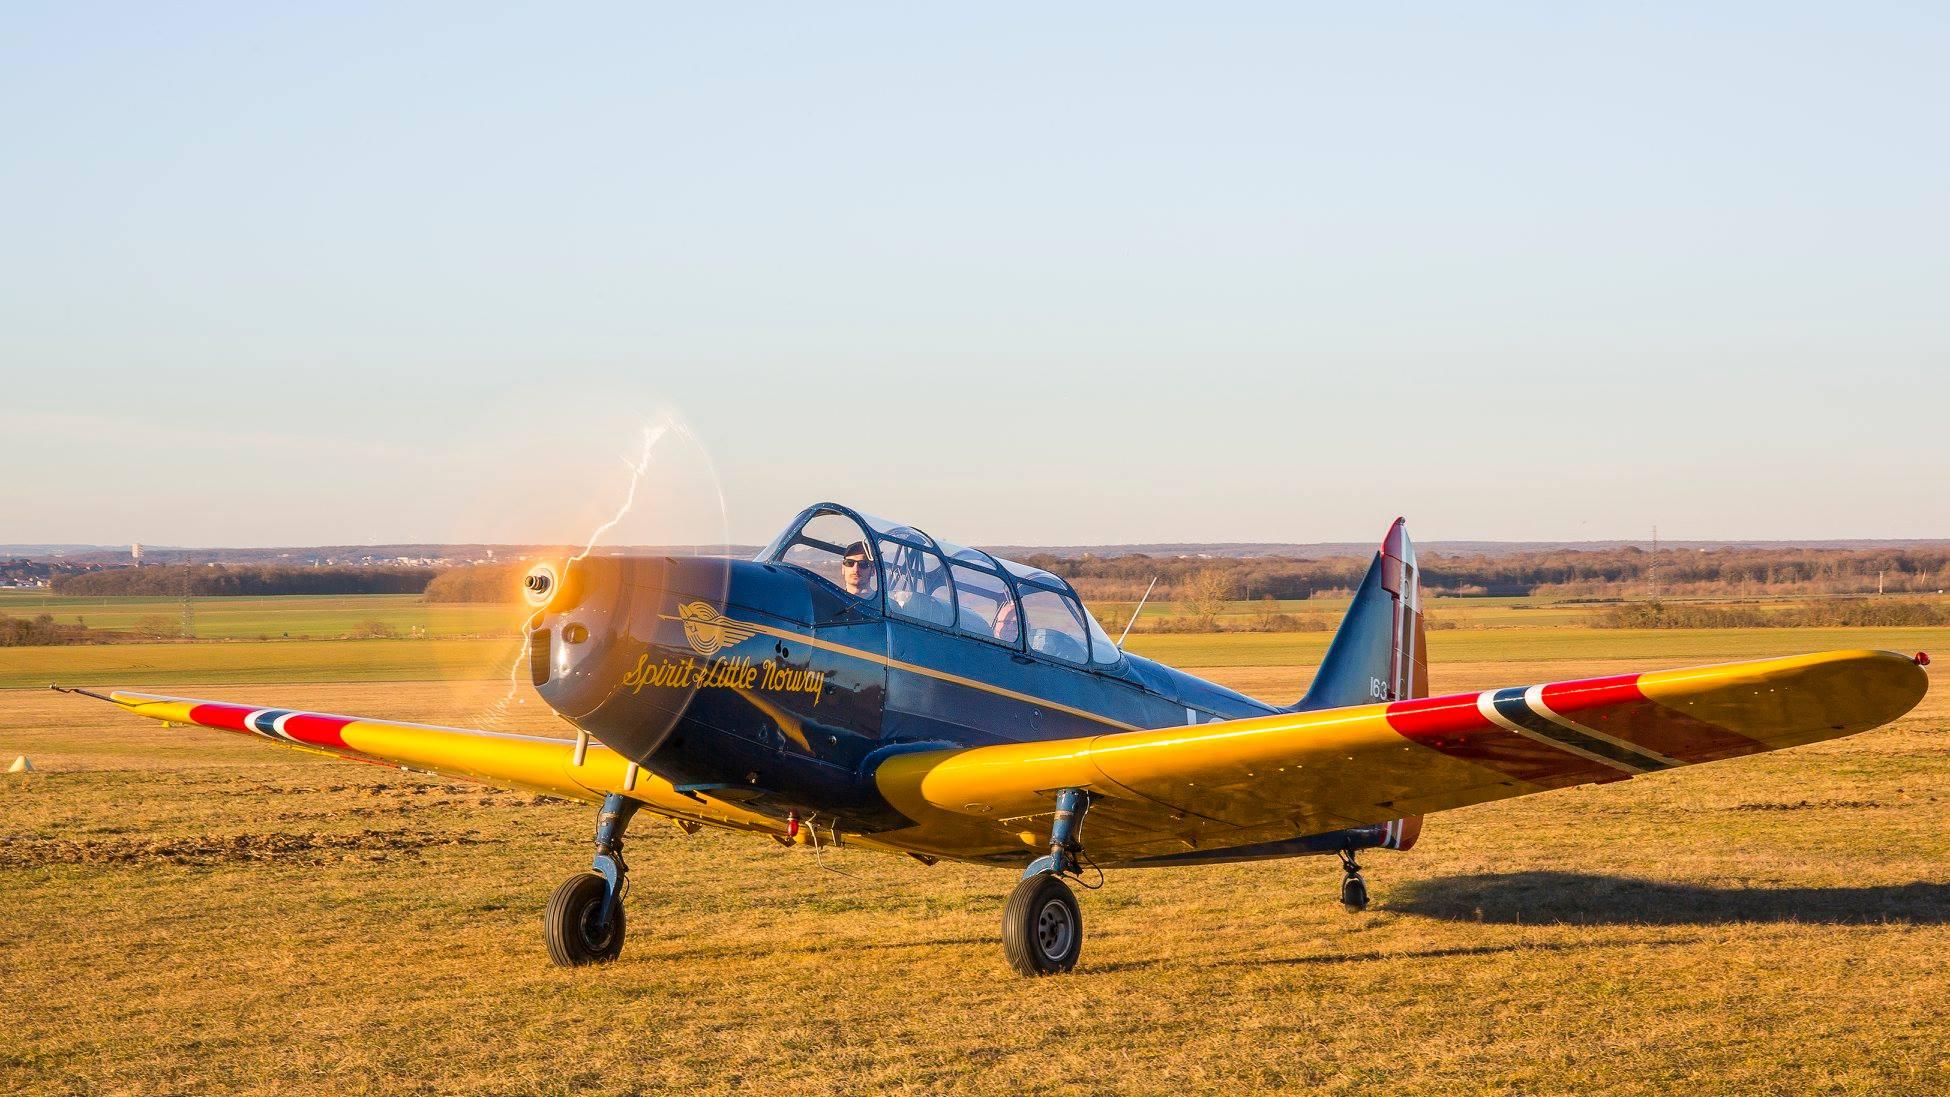 Fairchild PT-26B CornellT43-4536 - N73520 ( photo © Franck Rister)